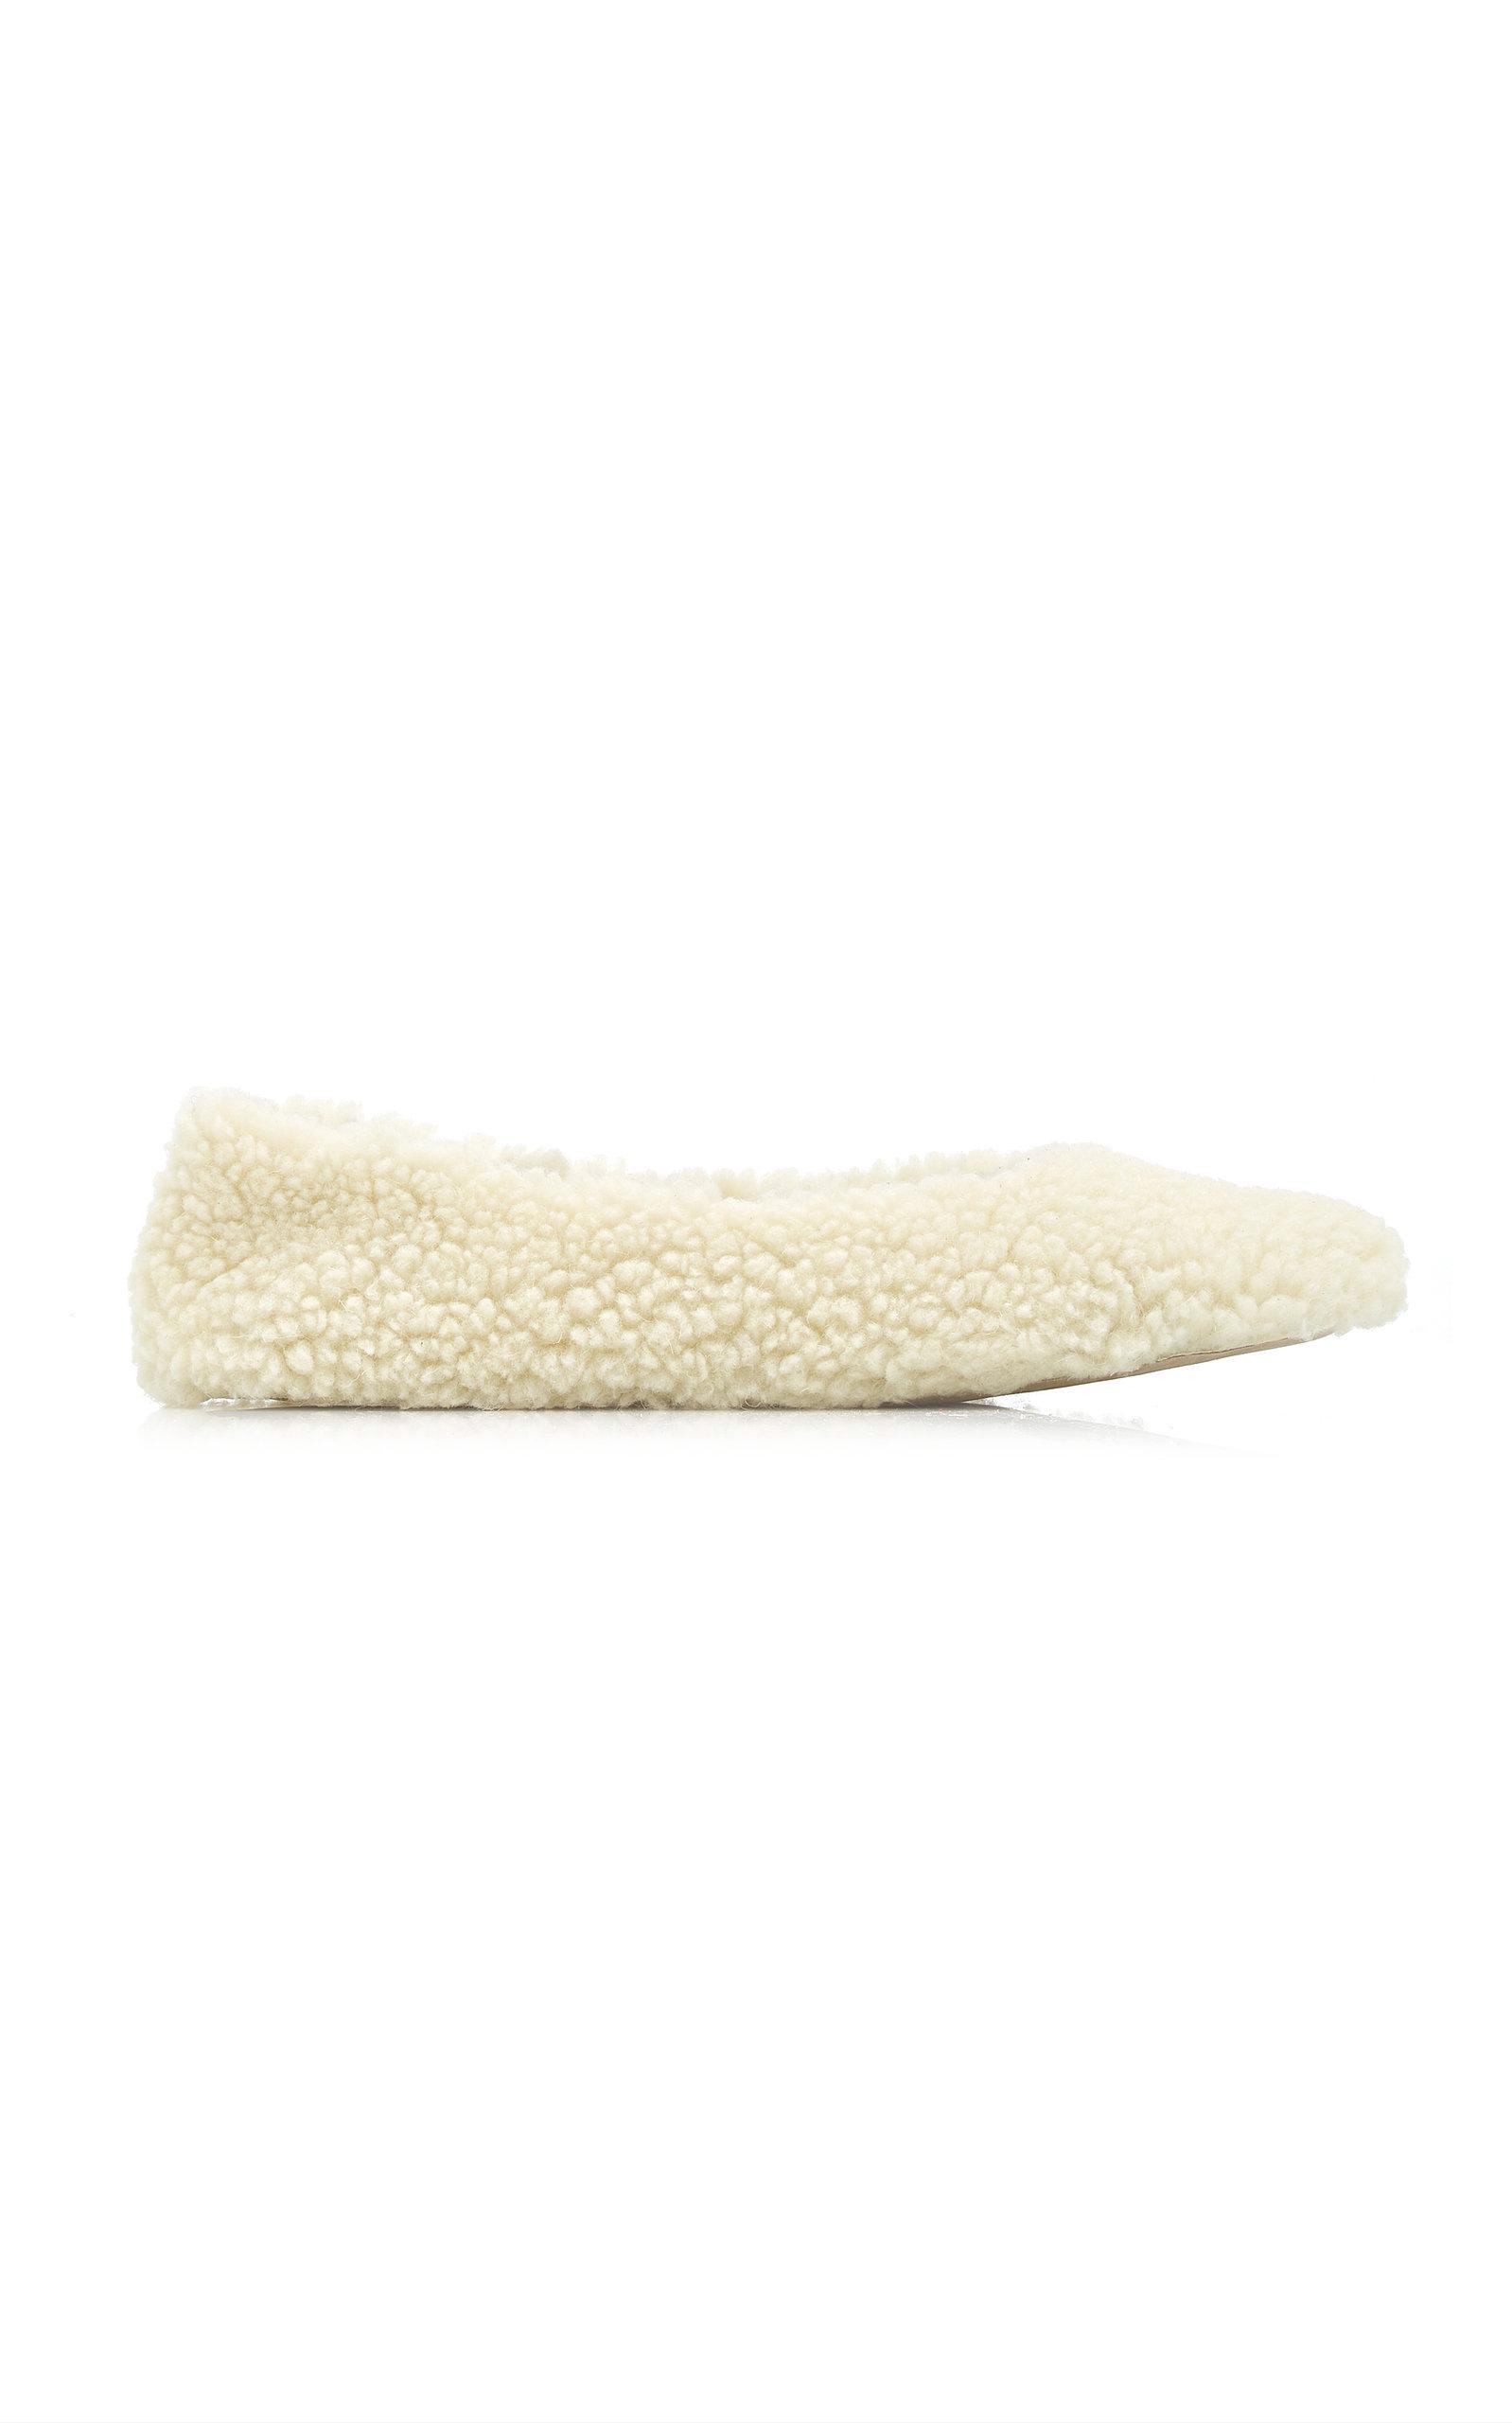 Flattered - Women's Nina Teddy Faux Fur Ballet Flats - White - Moda Operandi